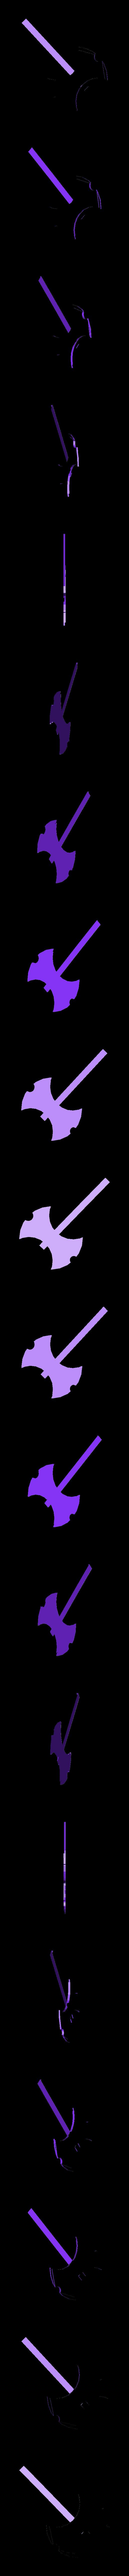 battle_axe_01_nfr.stl Download free STL file Viking Battle Axe • 3D print template, Steedrick